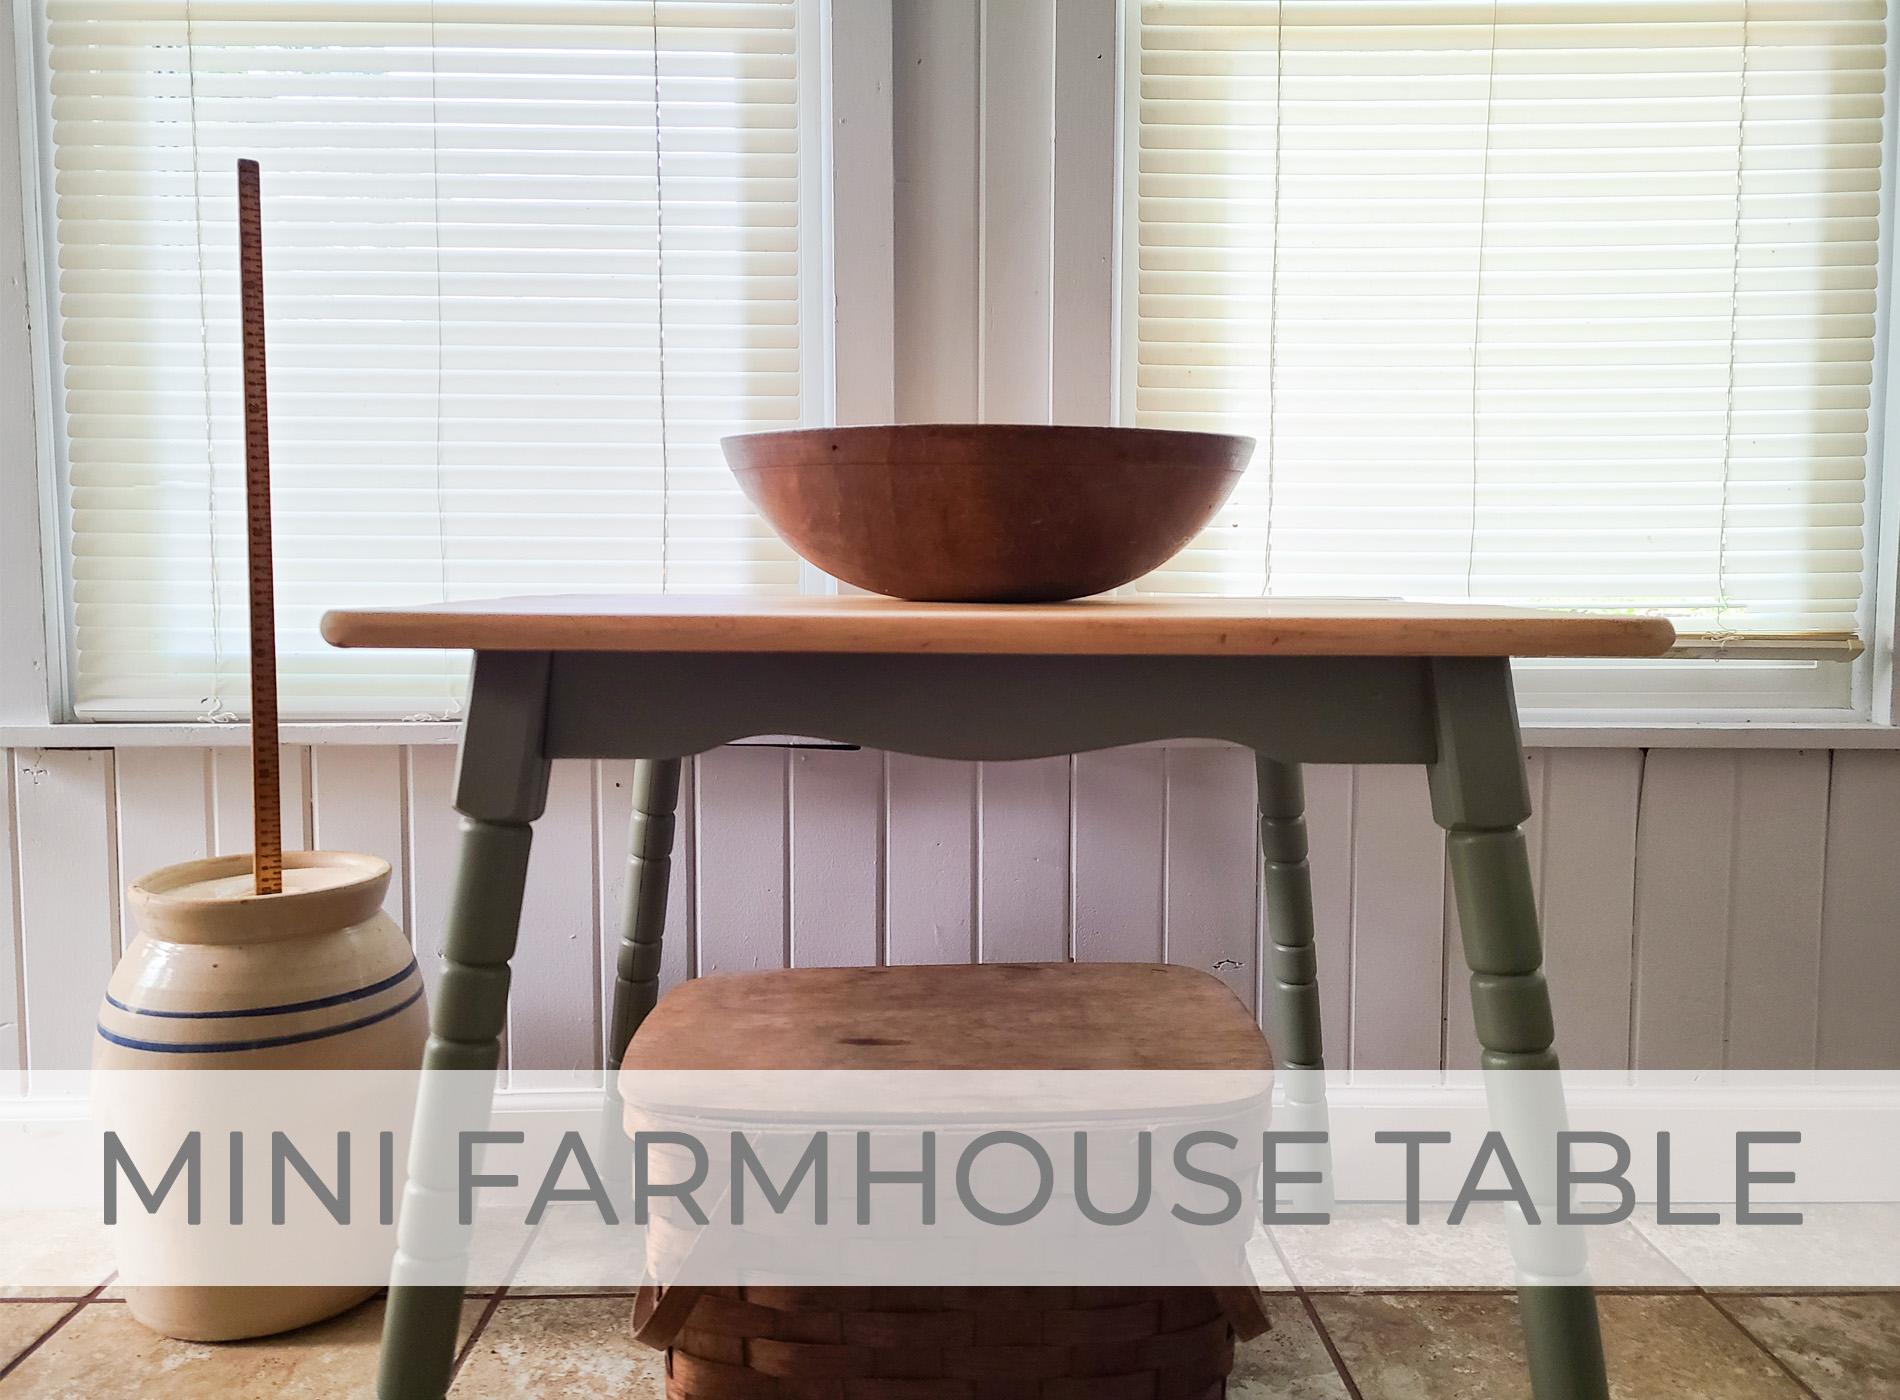 Mini Farmhouse Table Makeover by Larissa of Prodigal Pieces   prodigalpieces.com #prodigalpieces